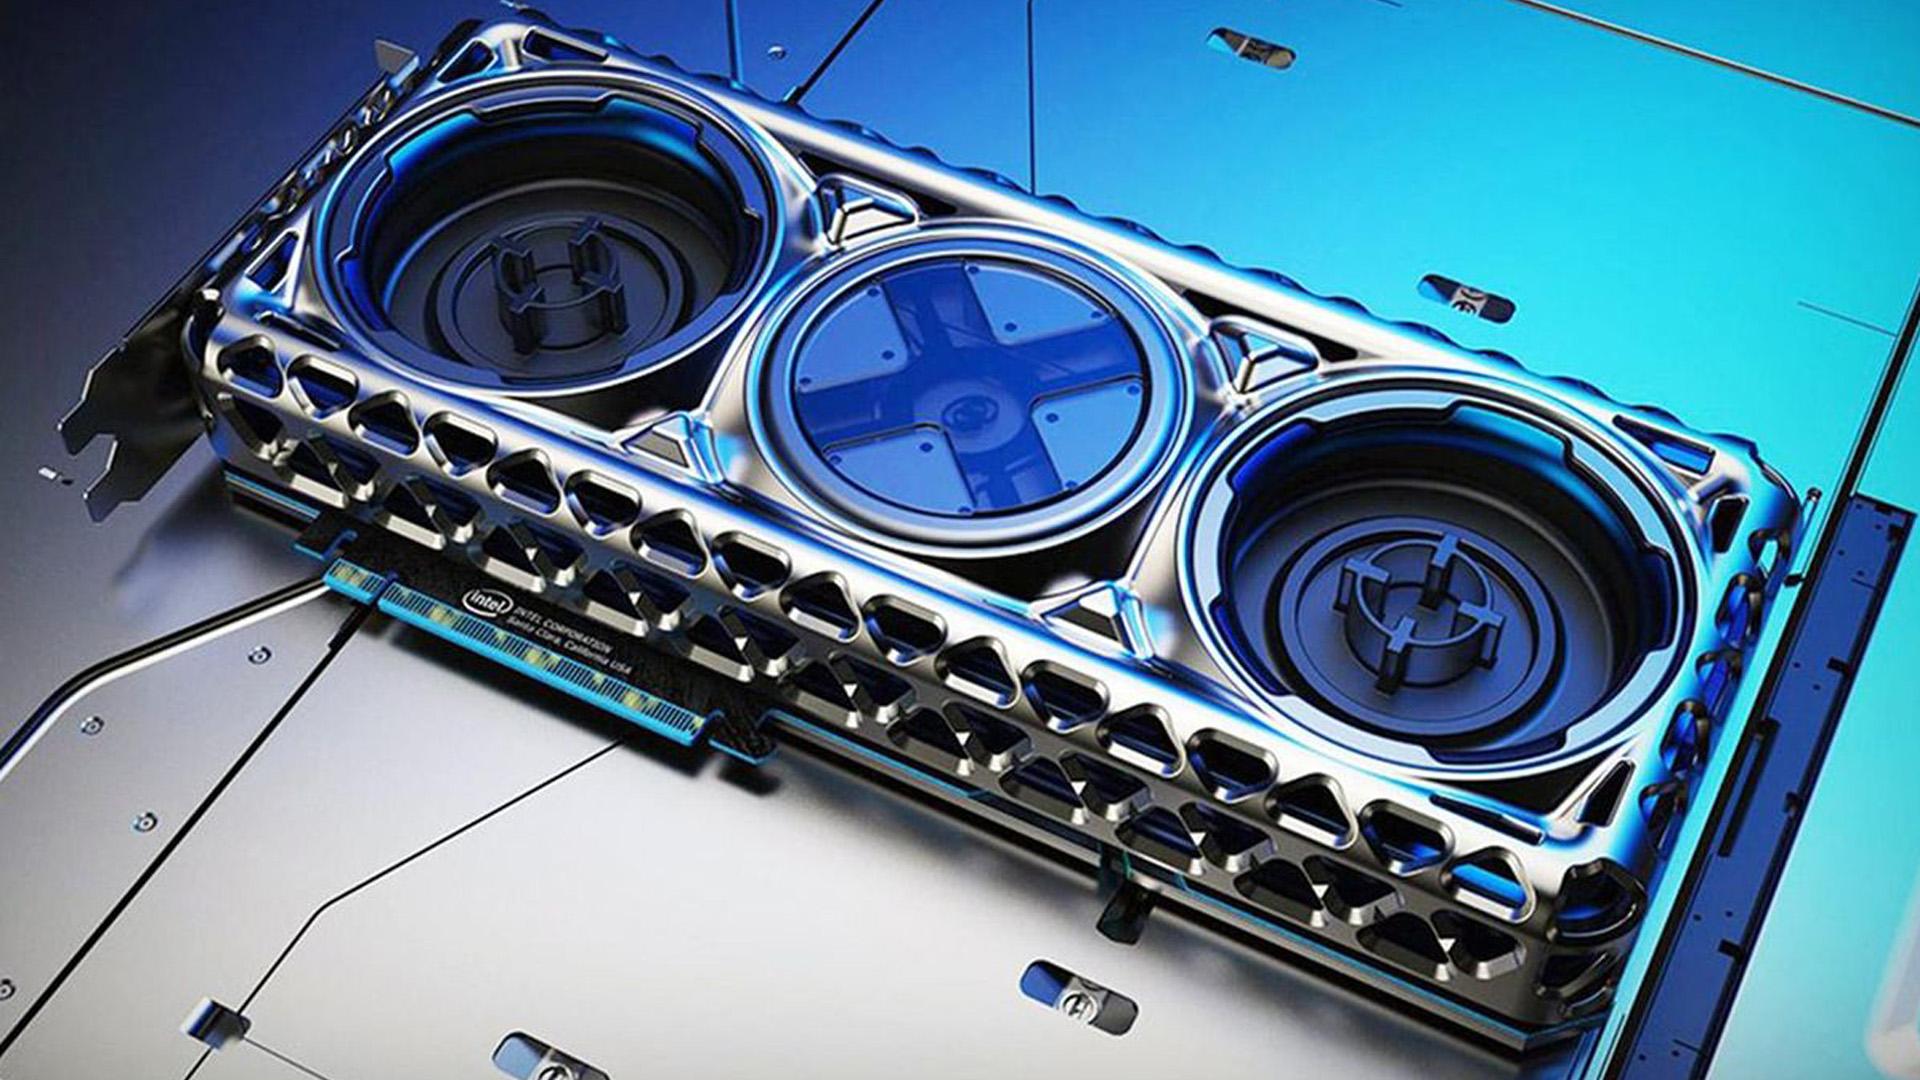 Intel-XE-HPG 01